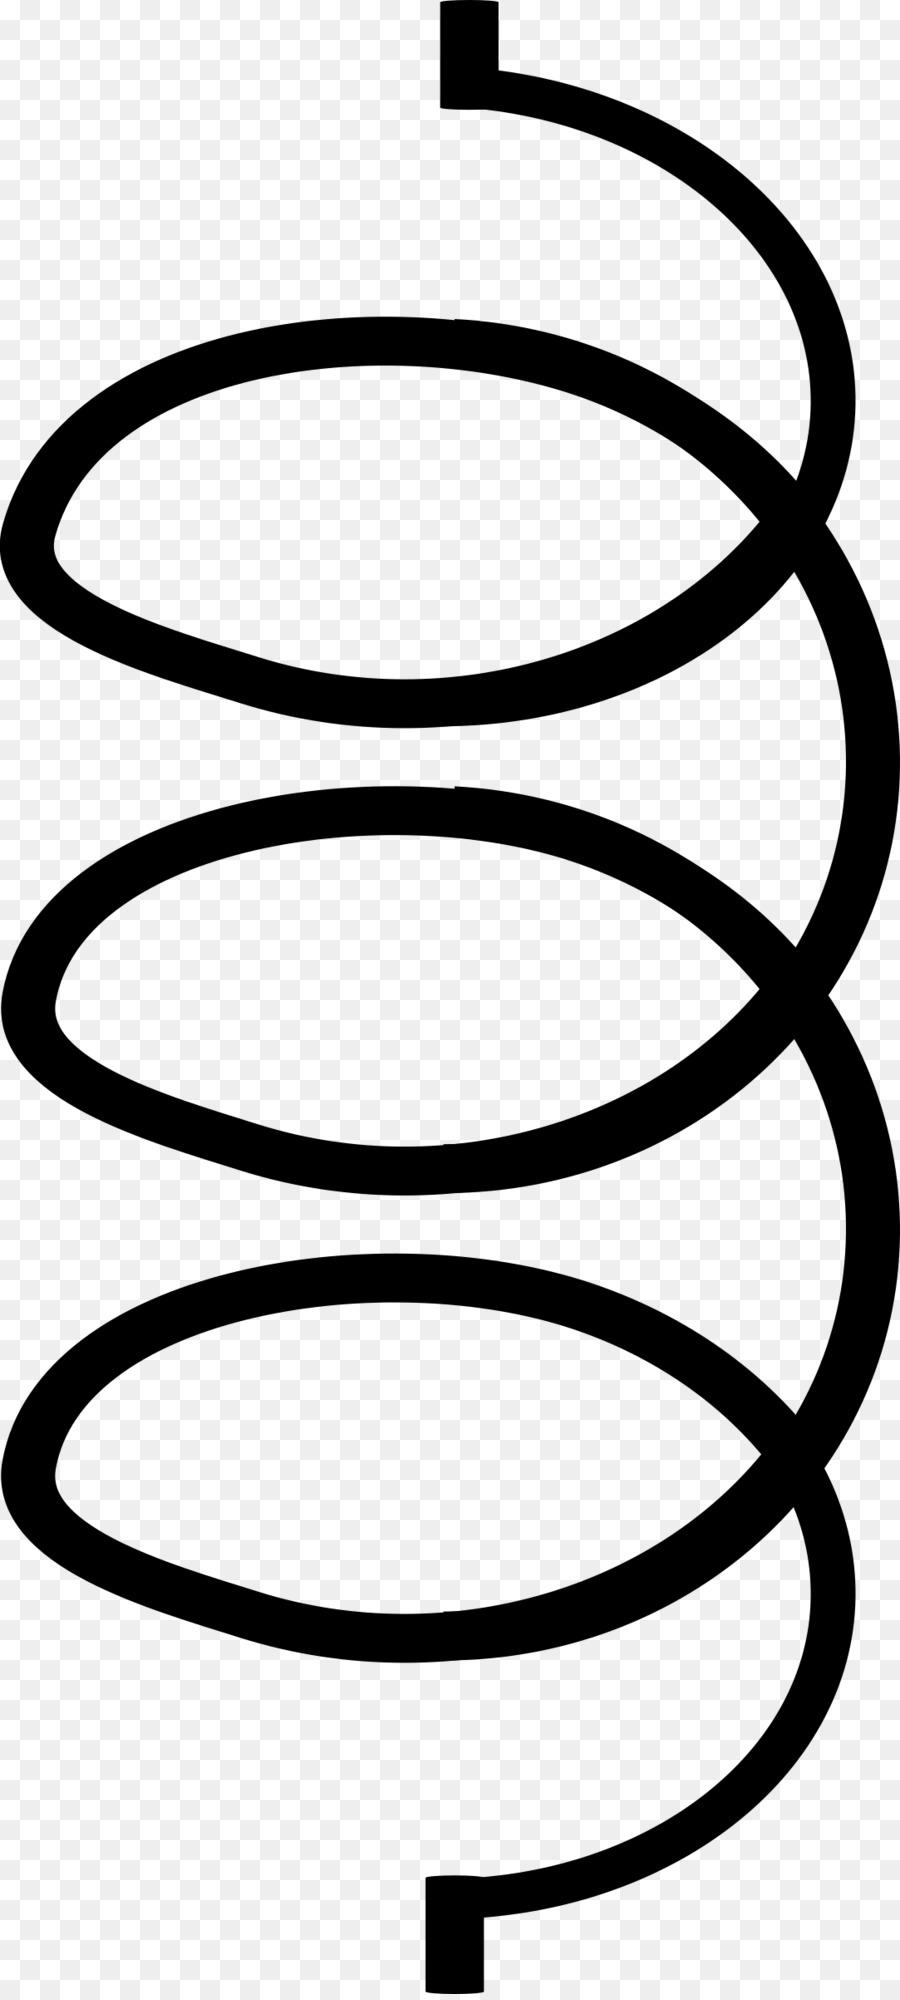 symbol, inductor, inductance, line art, angle png